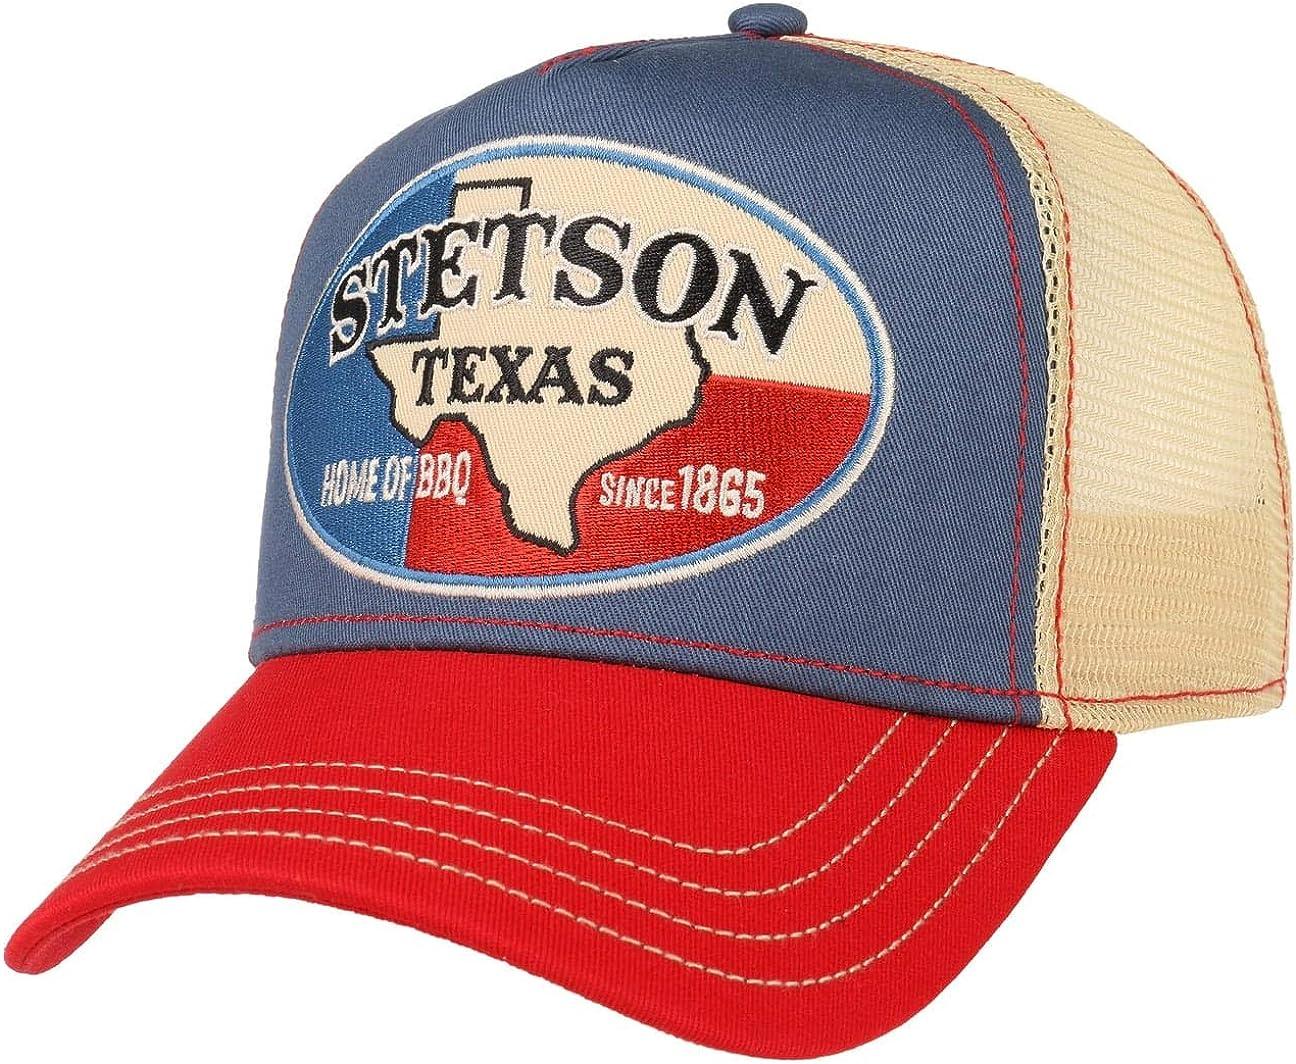 Stetson Gorra Trucker Texas Home of BBQ Mujer/Hombre - de Beisbol Baseball Malla Snapback, con Visera, Visera Verano/Invierno - Talla única Beige: Amazon.es: Ropa y accesorios